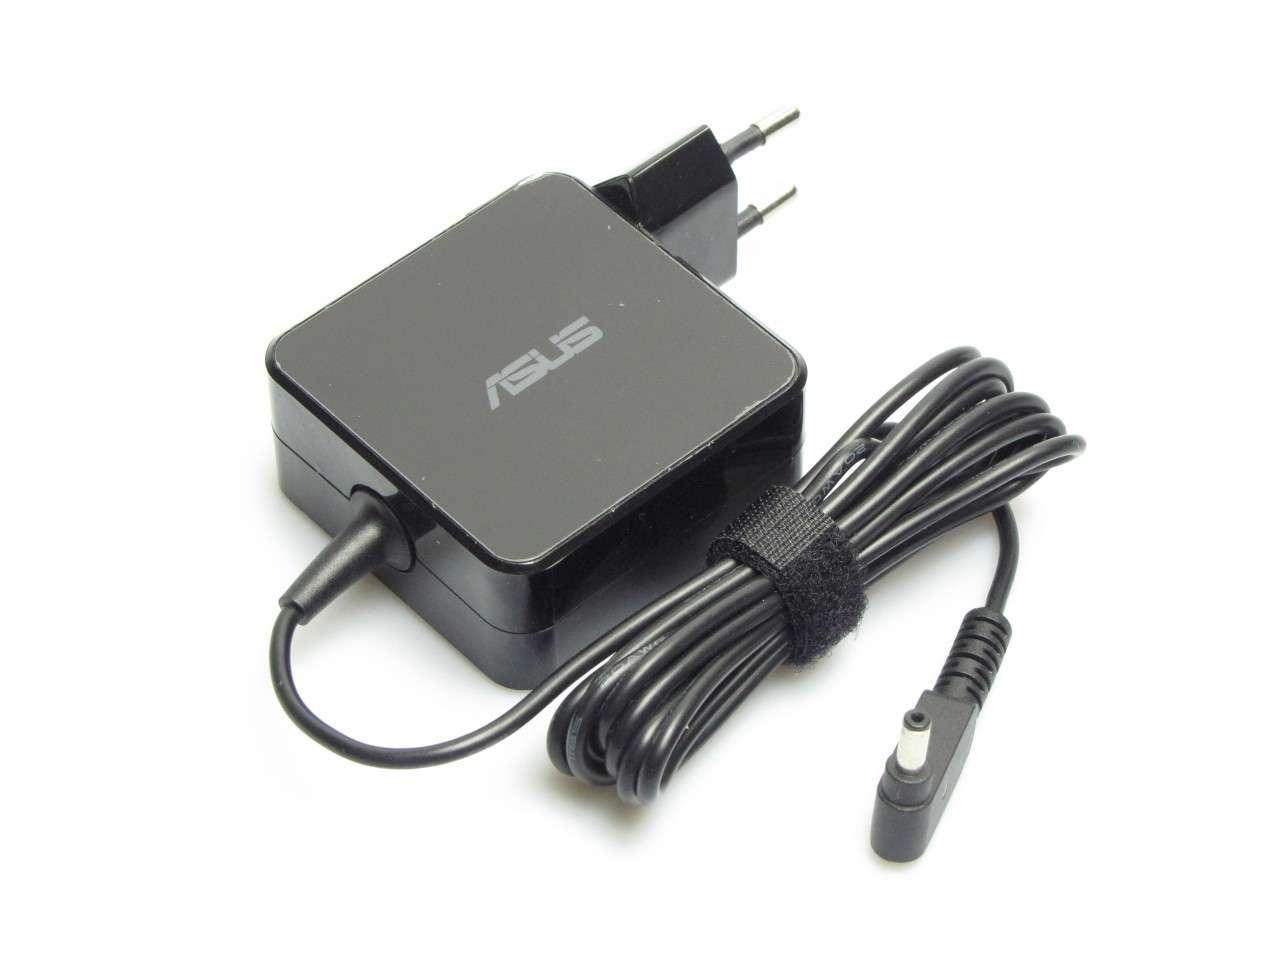 Incarcator Asus A553M Square Shape 65W imagine powerlaptop.ro 2021